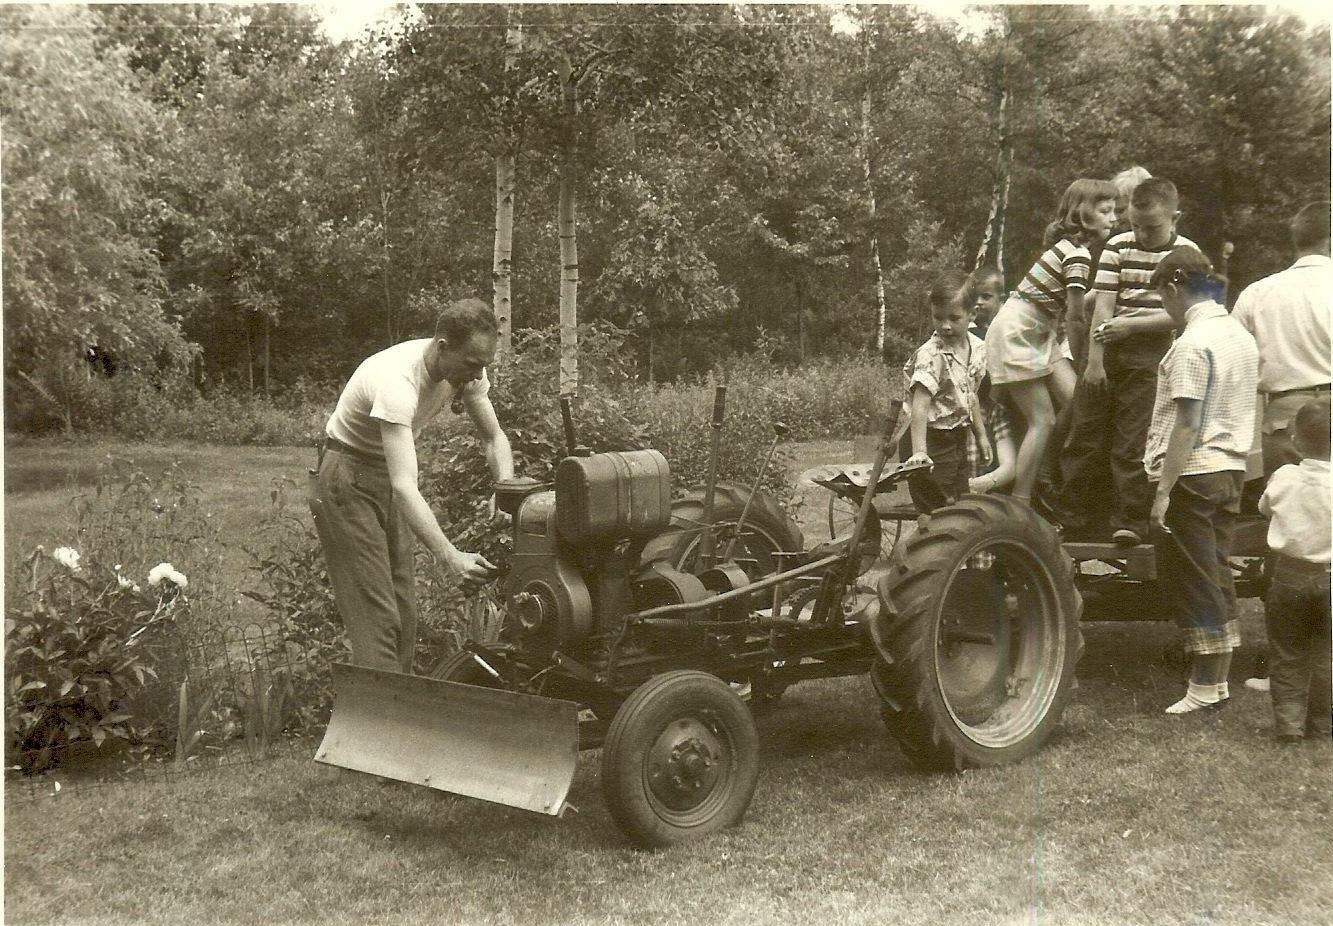 Robert Burns fires up his home-made tractor, Burlington MA